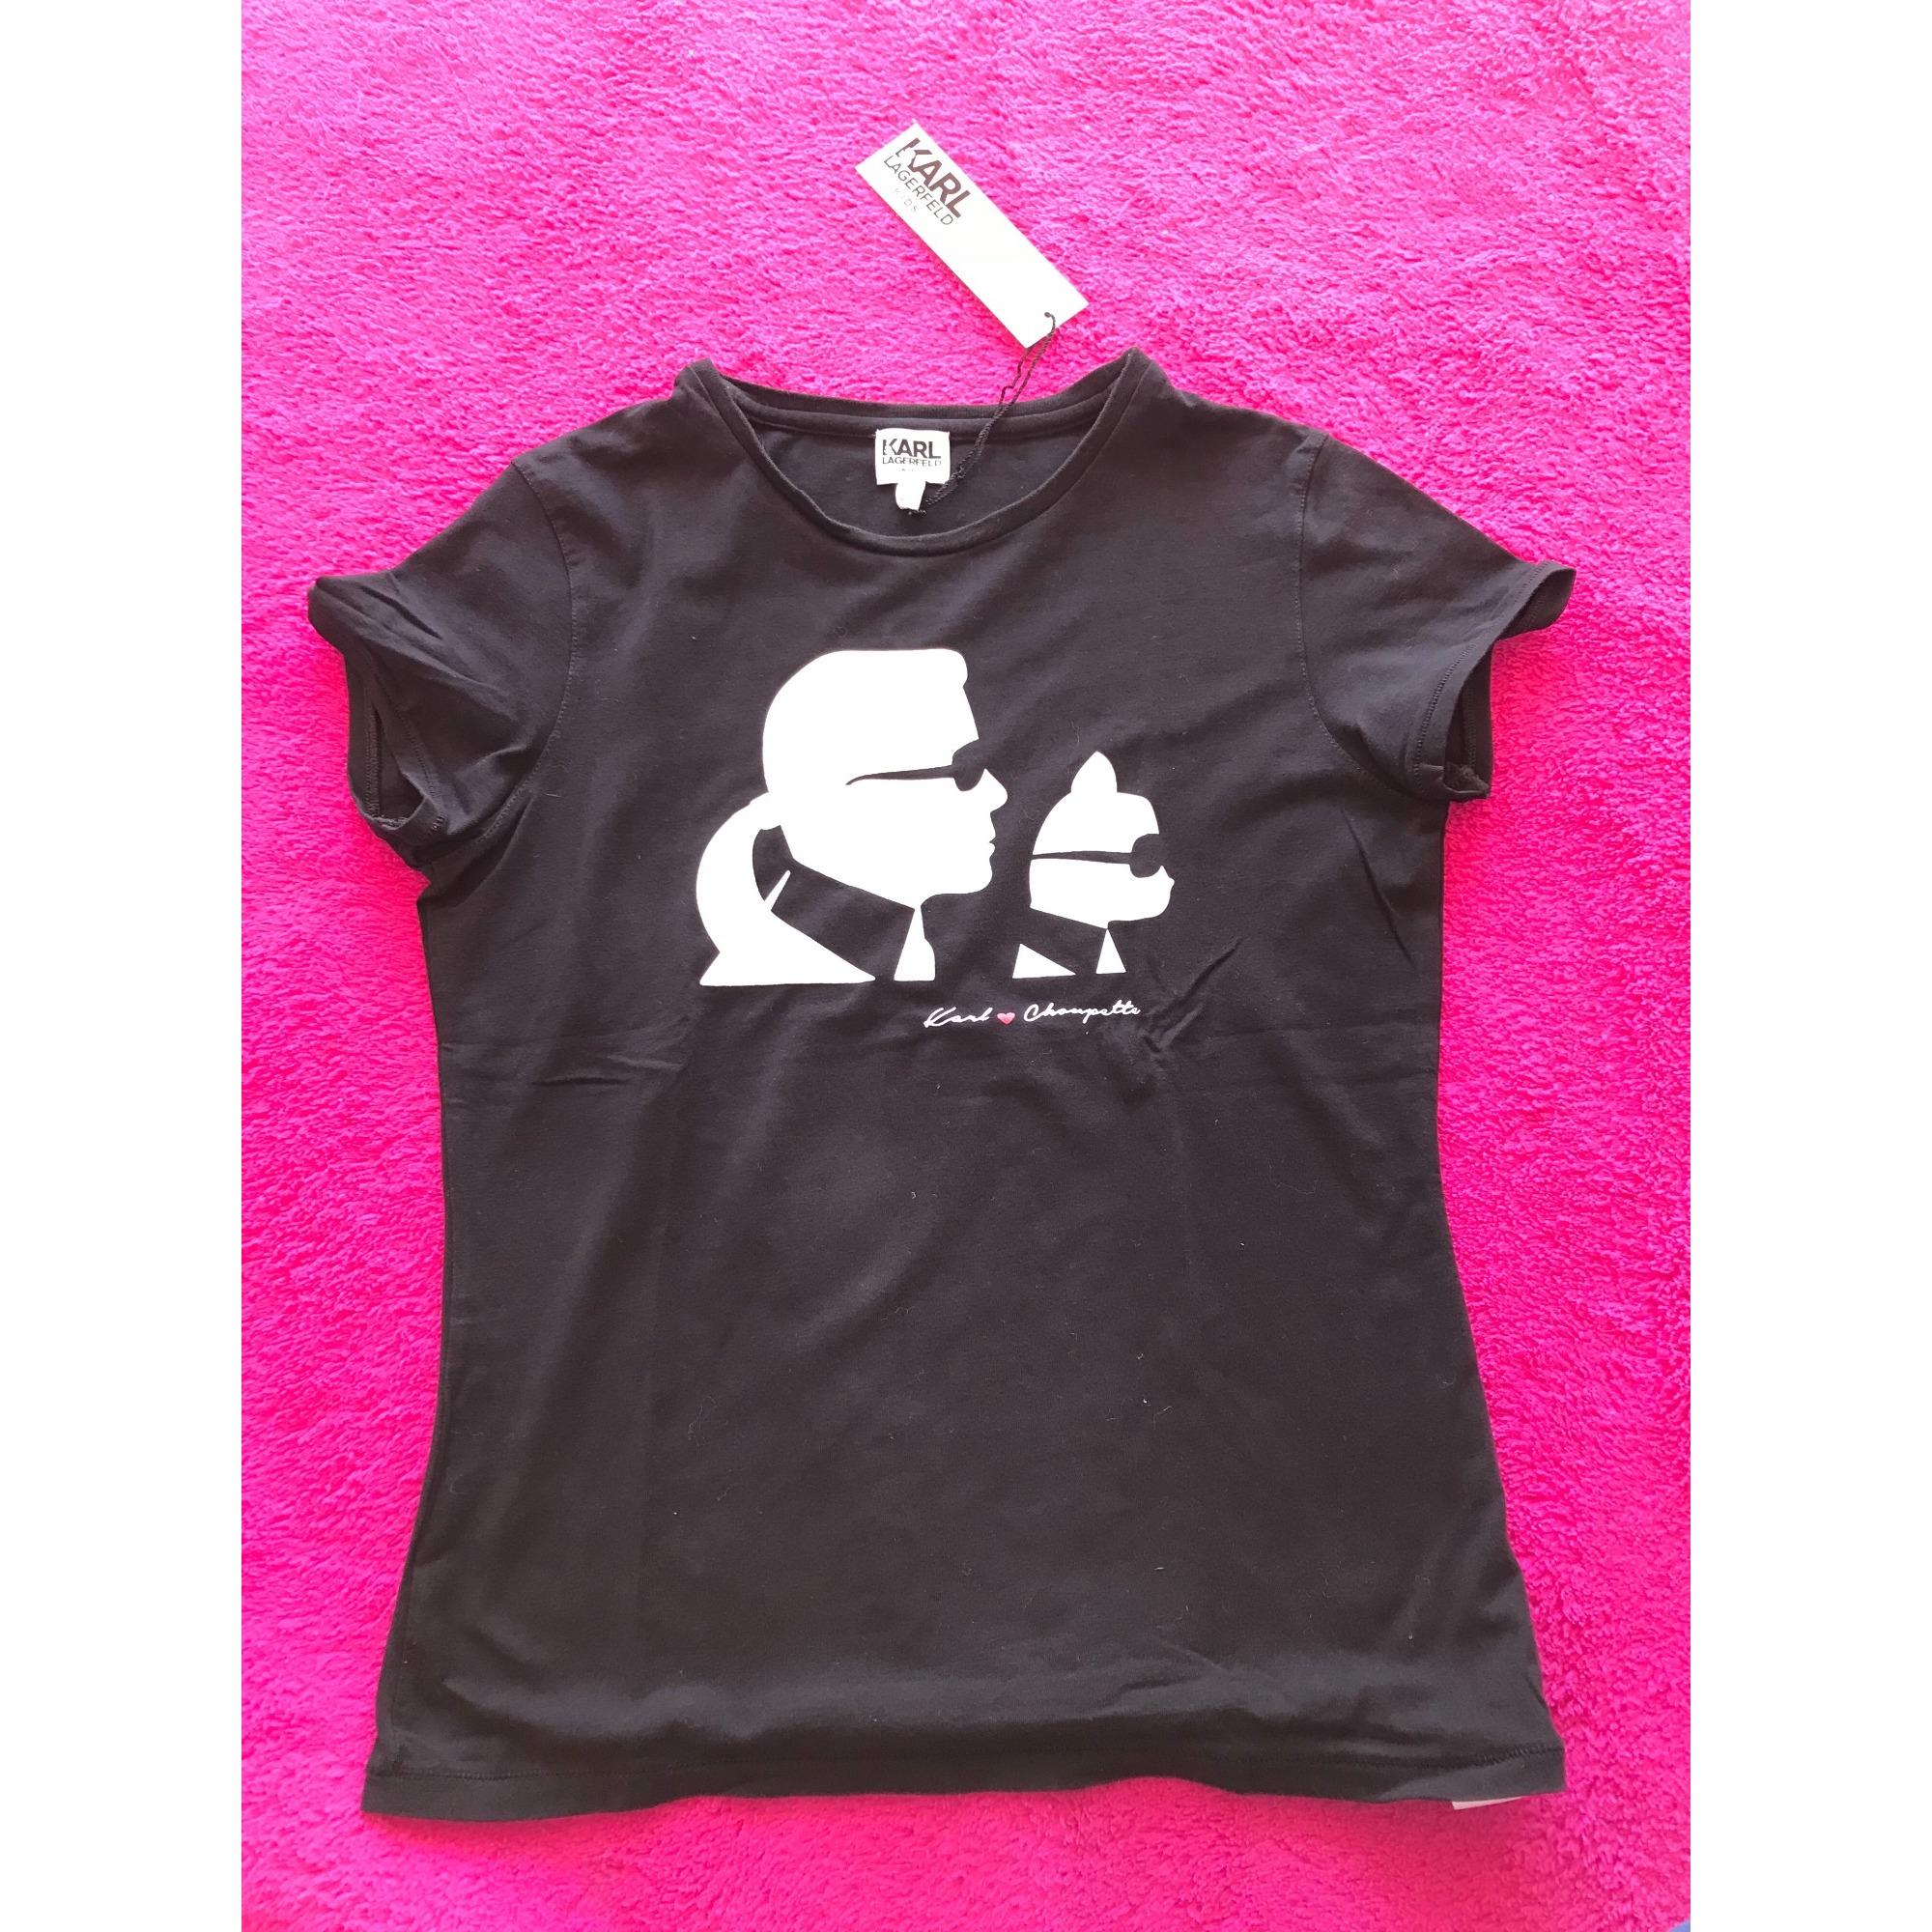 Top, Tee-shirt KARL LAGERFELD coton noir 15-16 ans